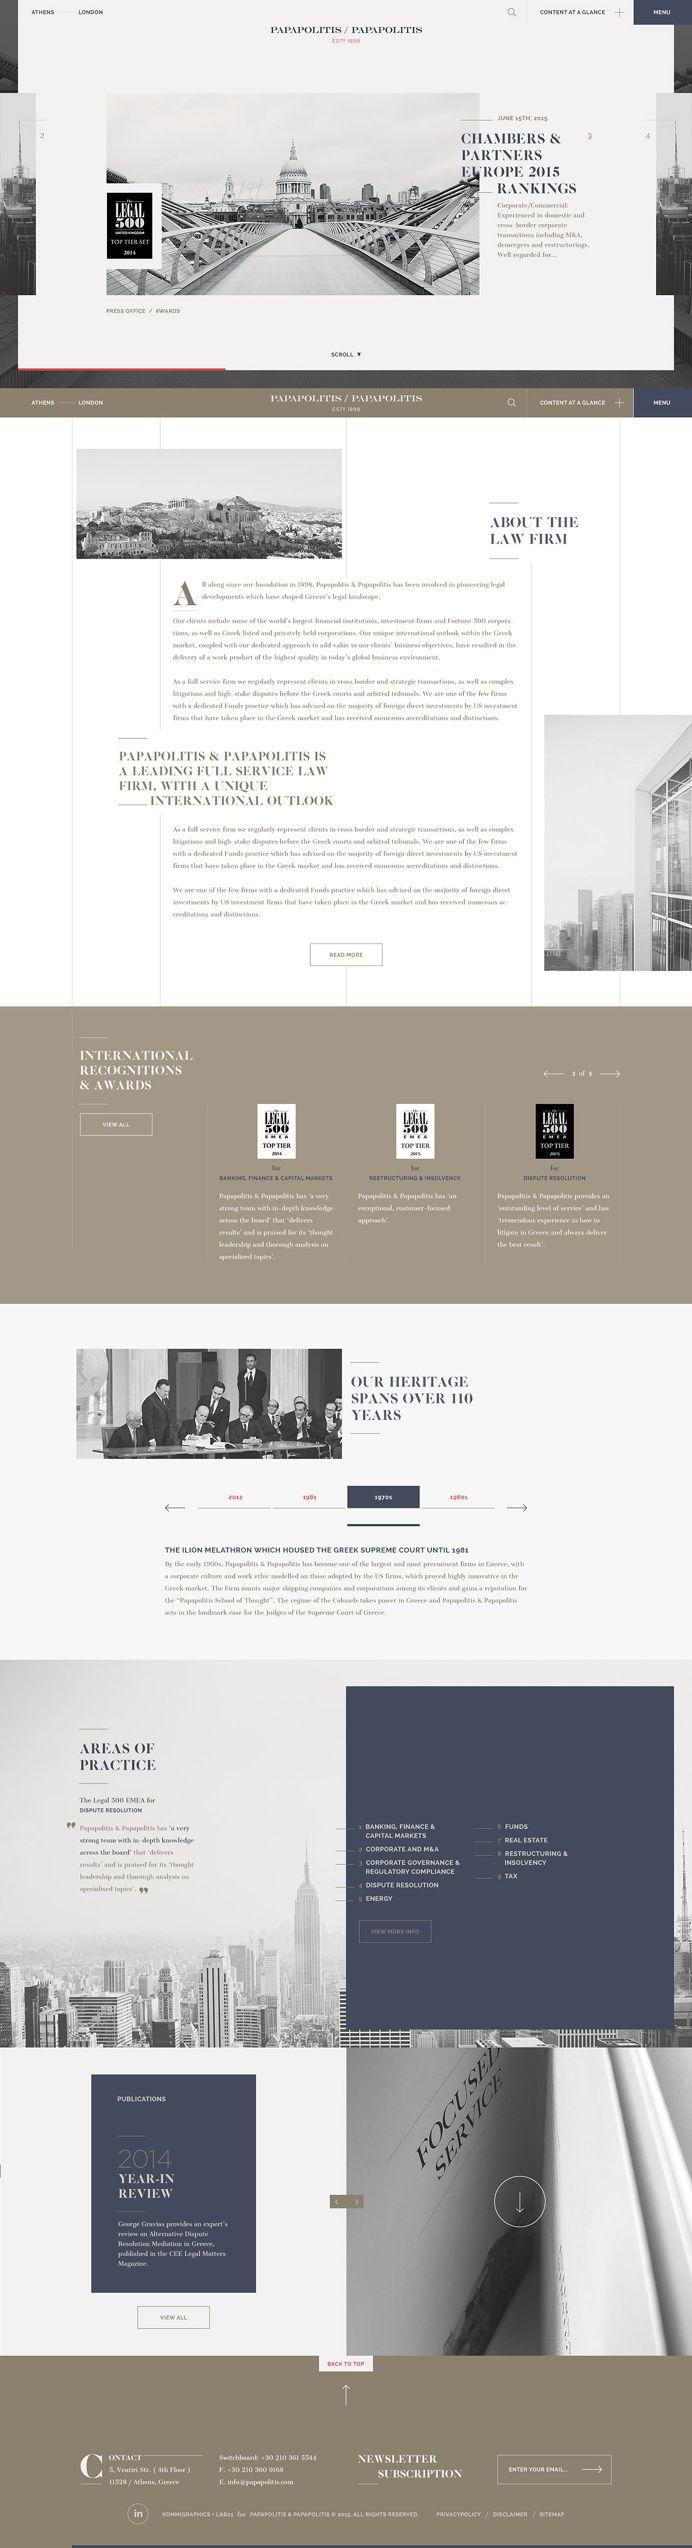 Papapolitis Website By Kommigraphics Web Design Website Corporate Design Corporat With Images Corporate Web Design Corporate Website Design Website Design Inspiration